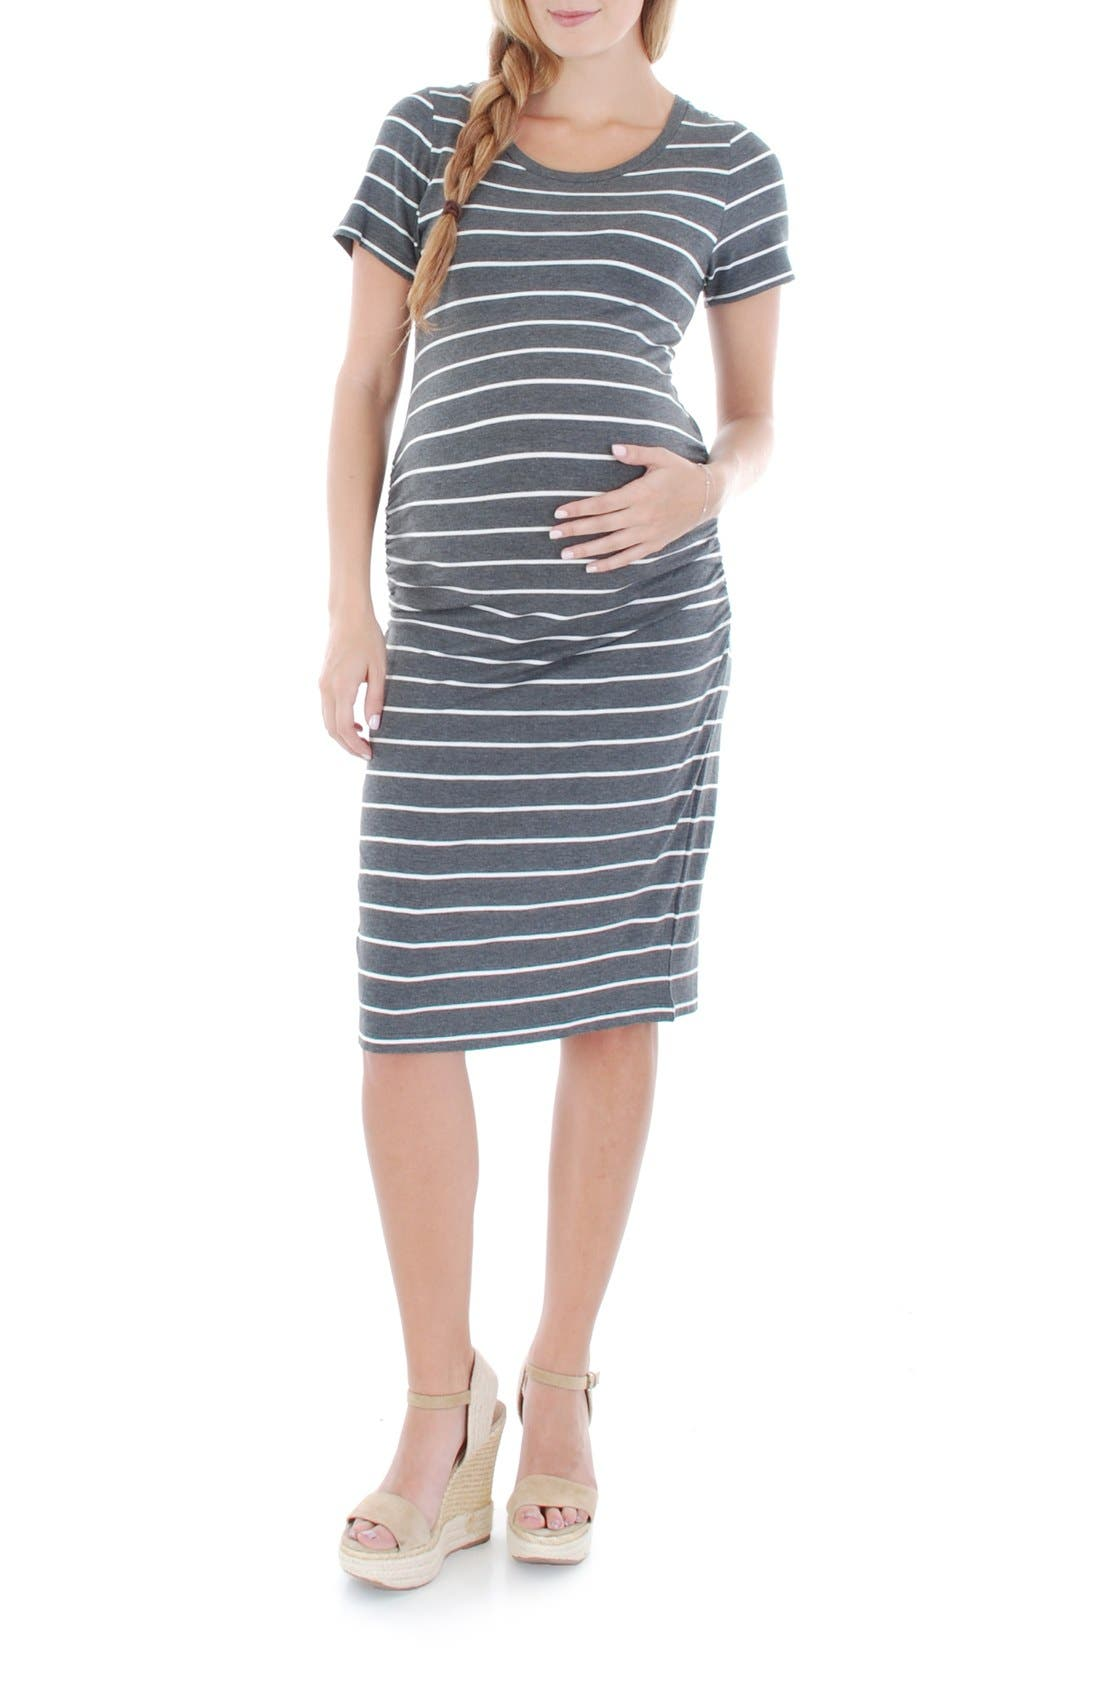 EVERLY GREY 'Camila' Stripe Maternity Dress